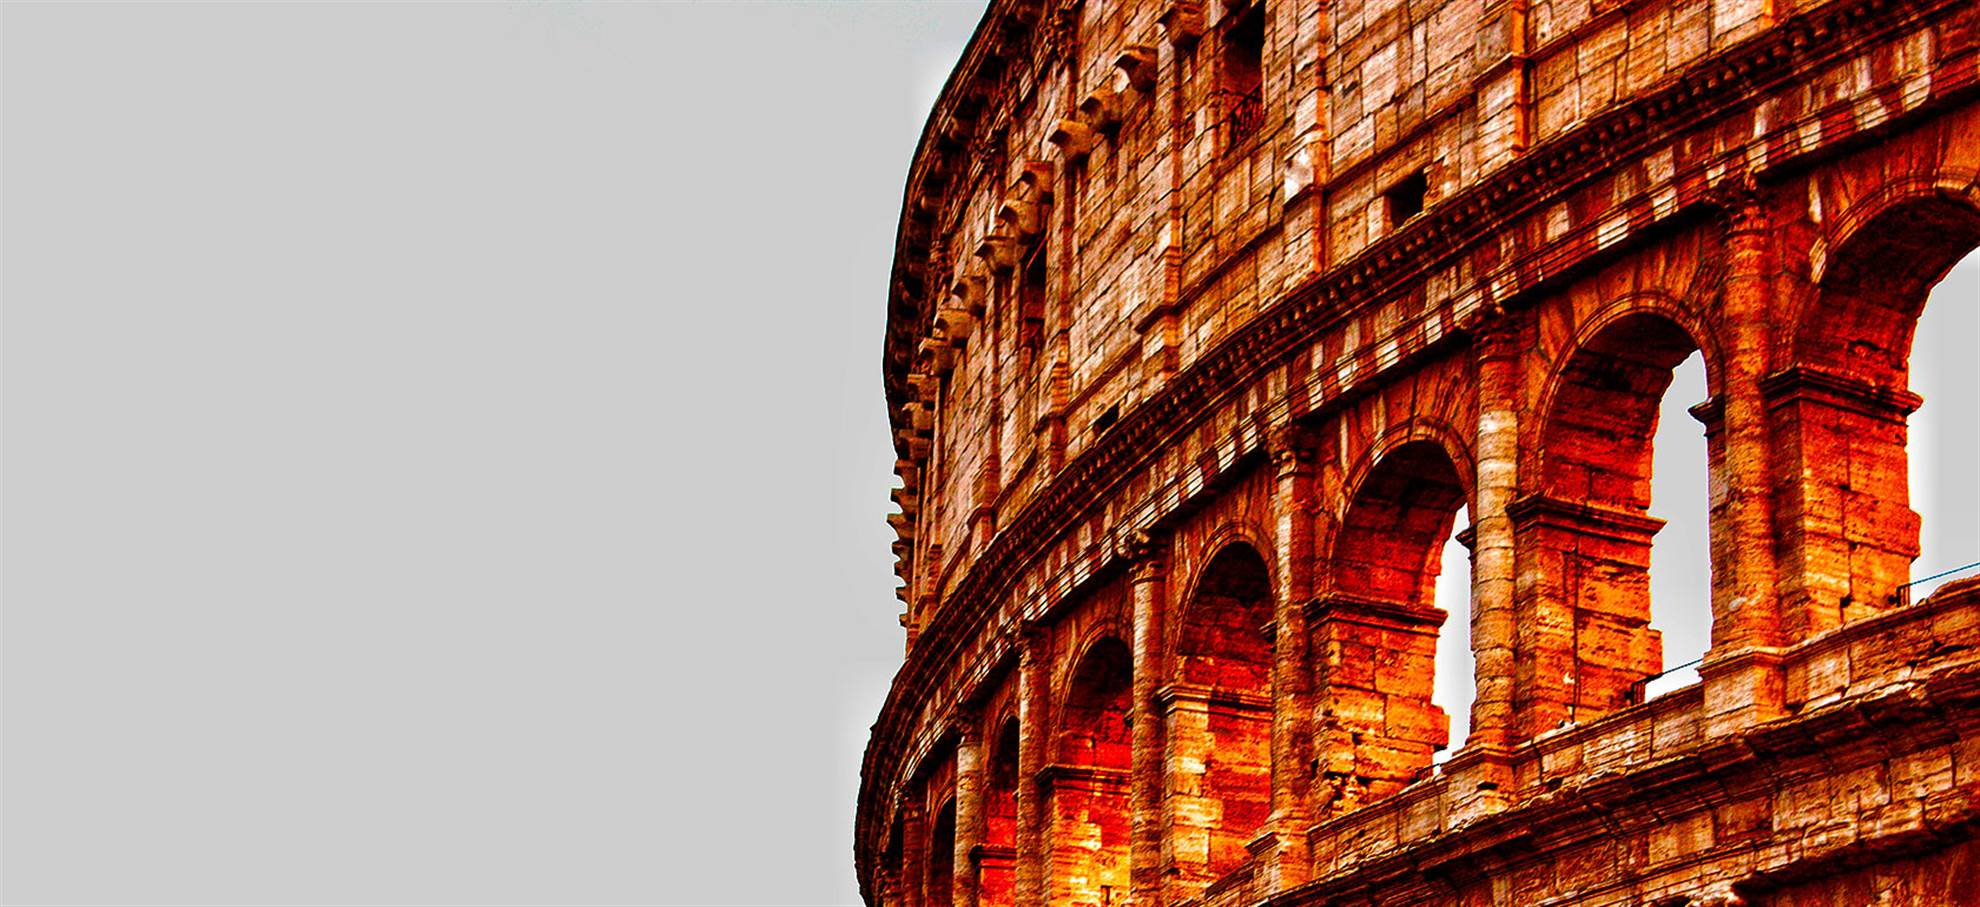 Ondergrondse Colosseum, de arenavloer, Forum Rom(anum & Palatijn heuvel (P2BUAS)